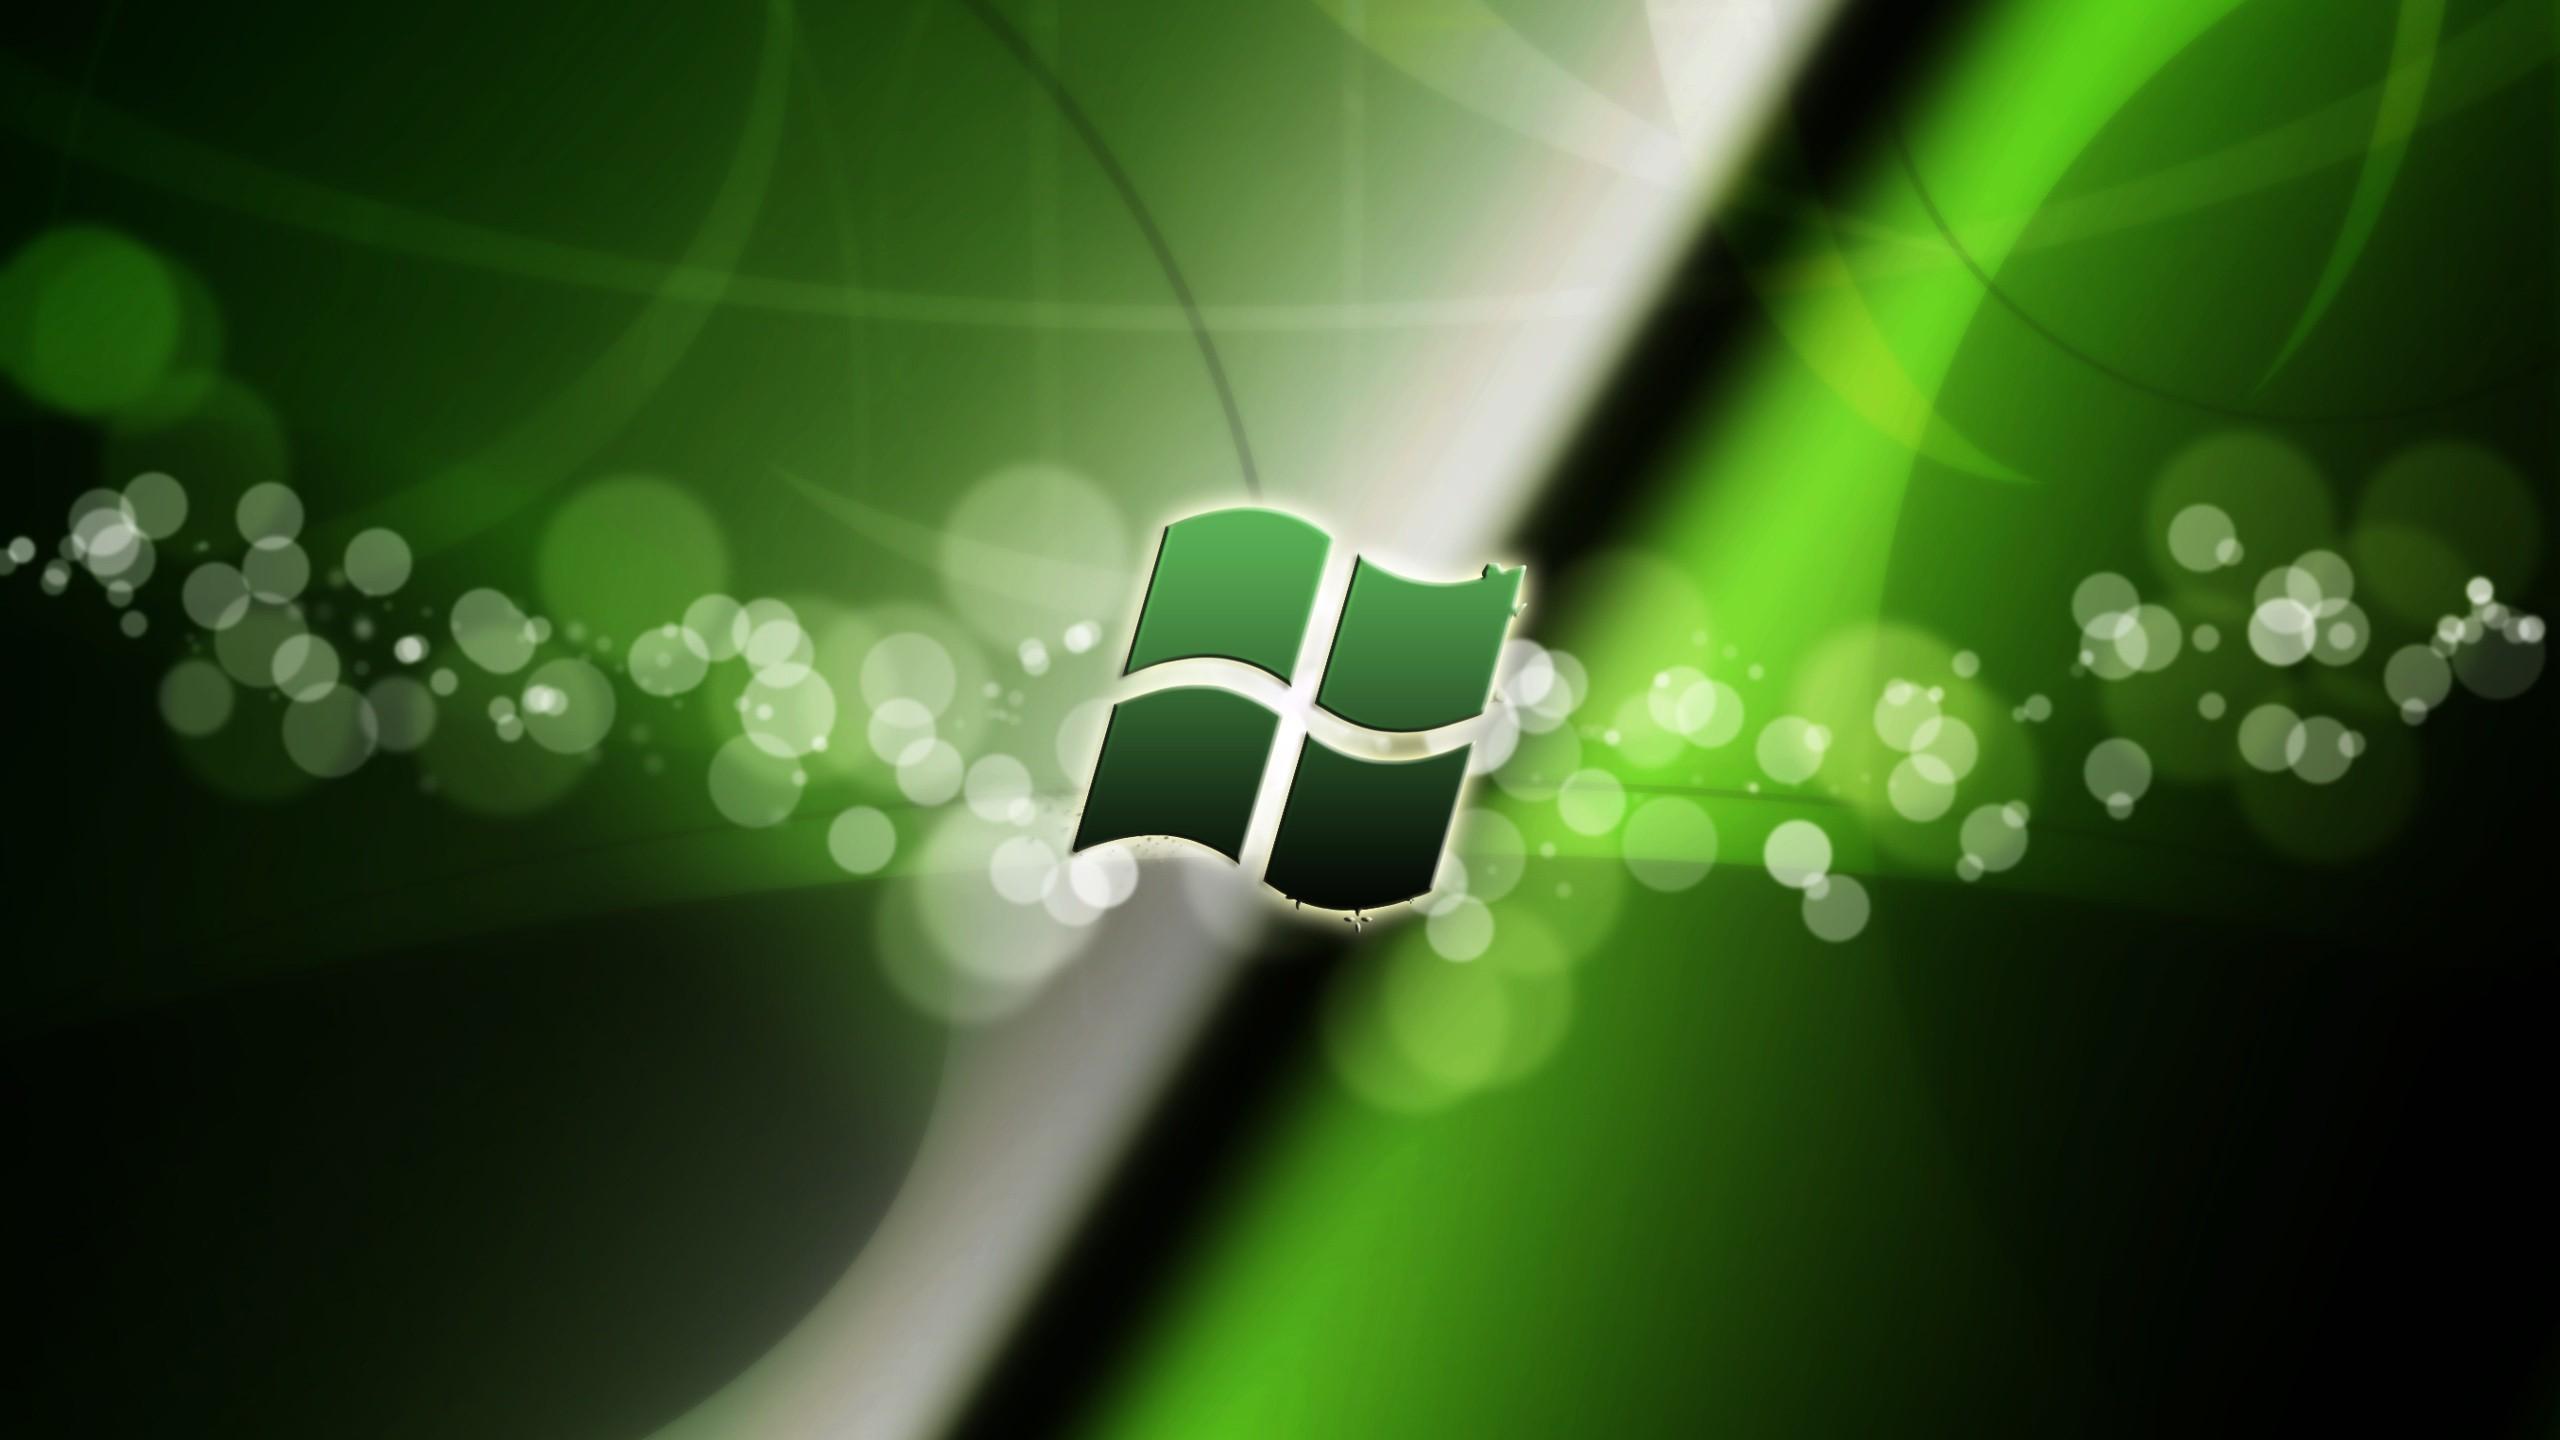 Windows 1.0 Desktop Backgrounds HP